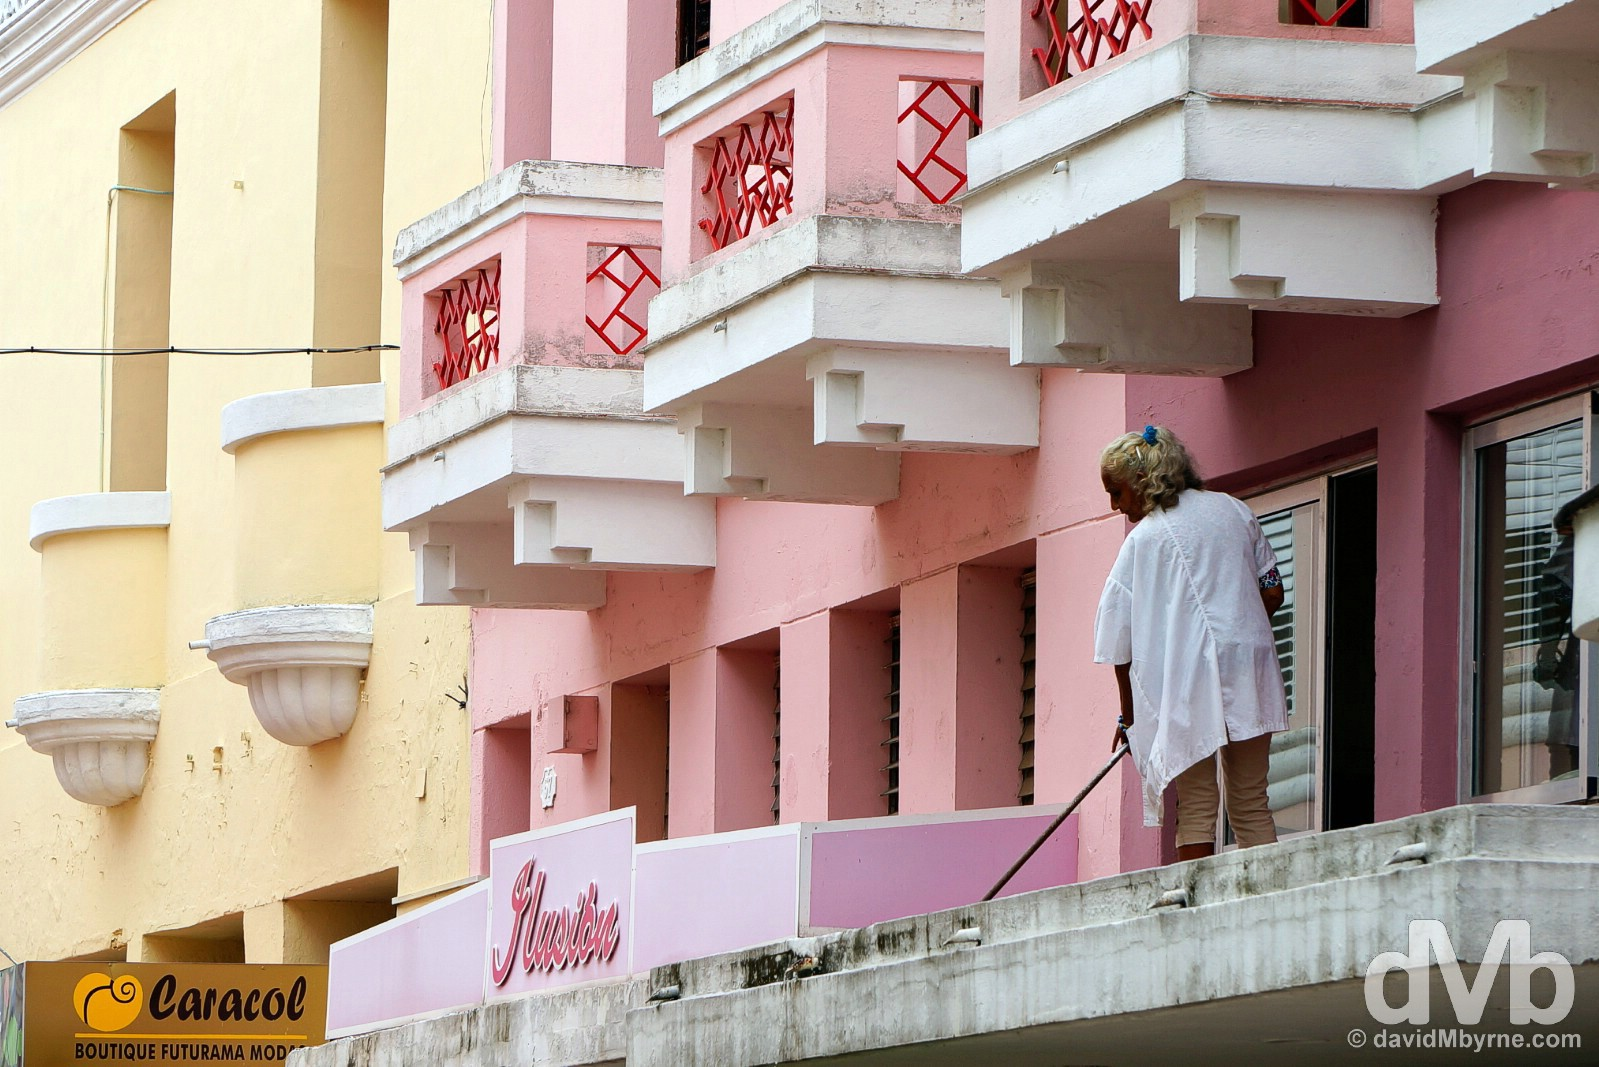 Maceo, Camaguey, Cuba. May 4, 2015.